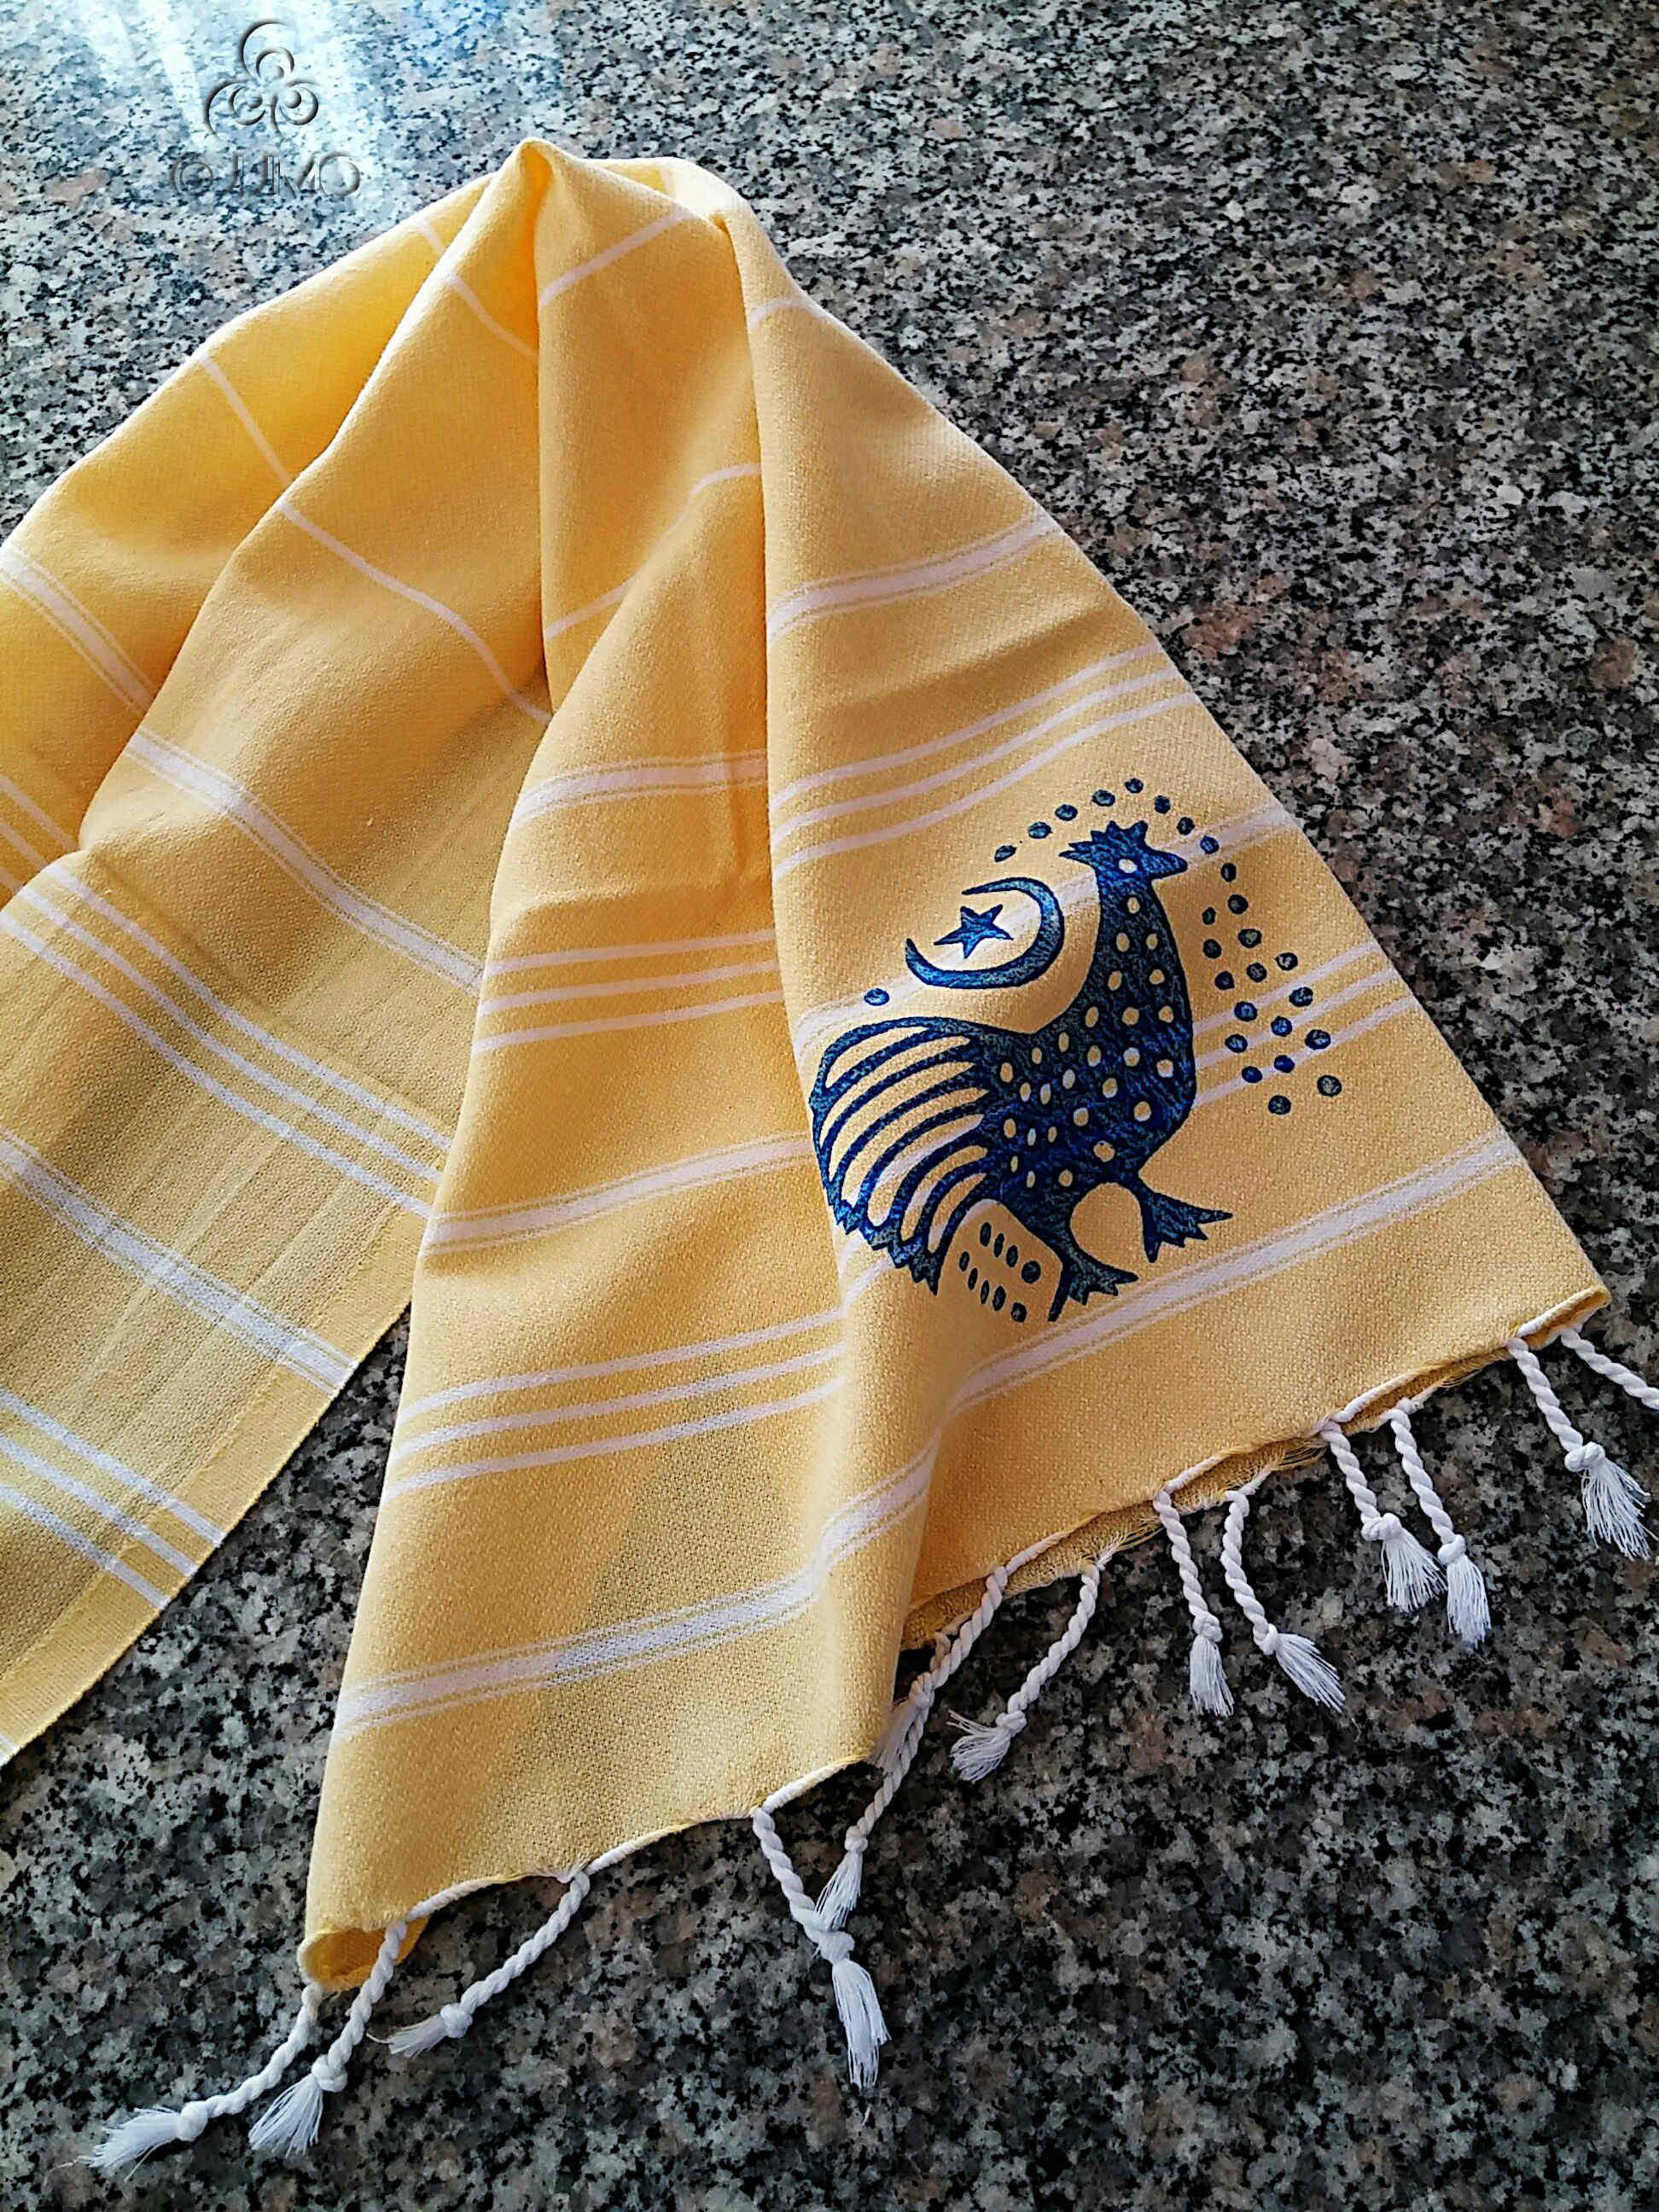 50x80cm Hand Block Printed Blue On Yellow Kitchen Towel Peshtemal